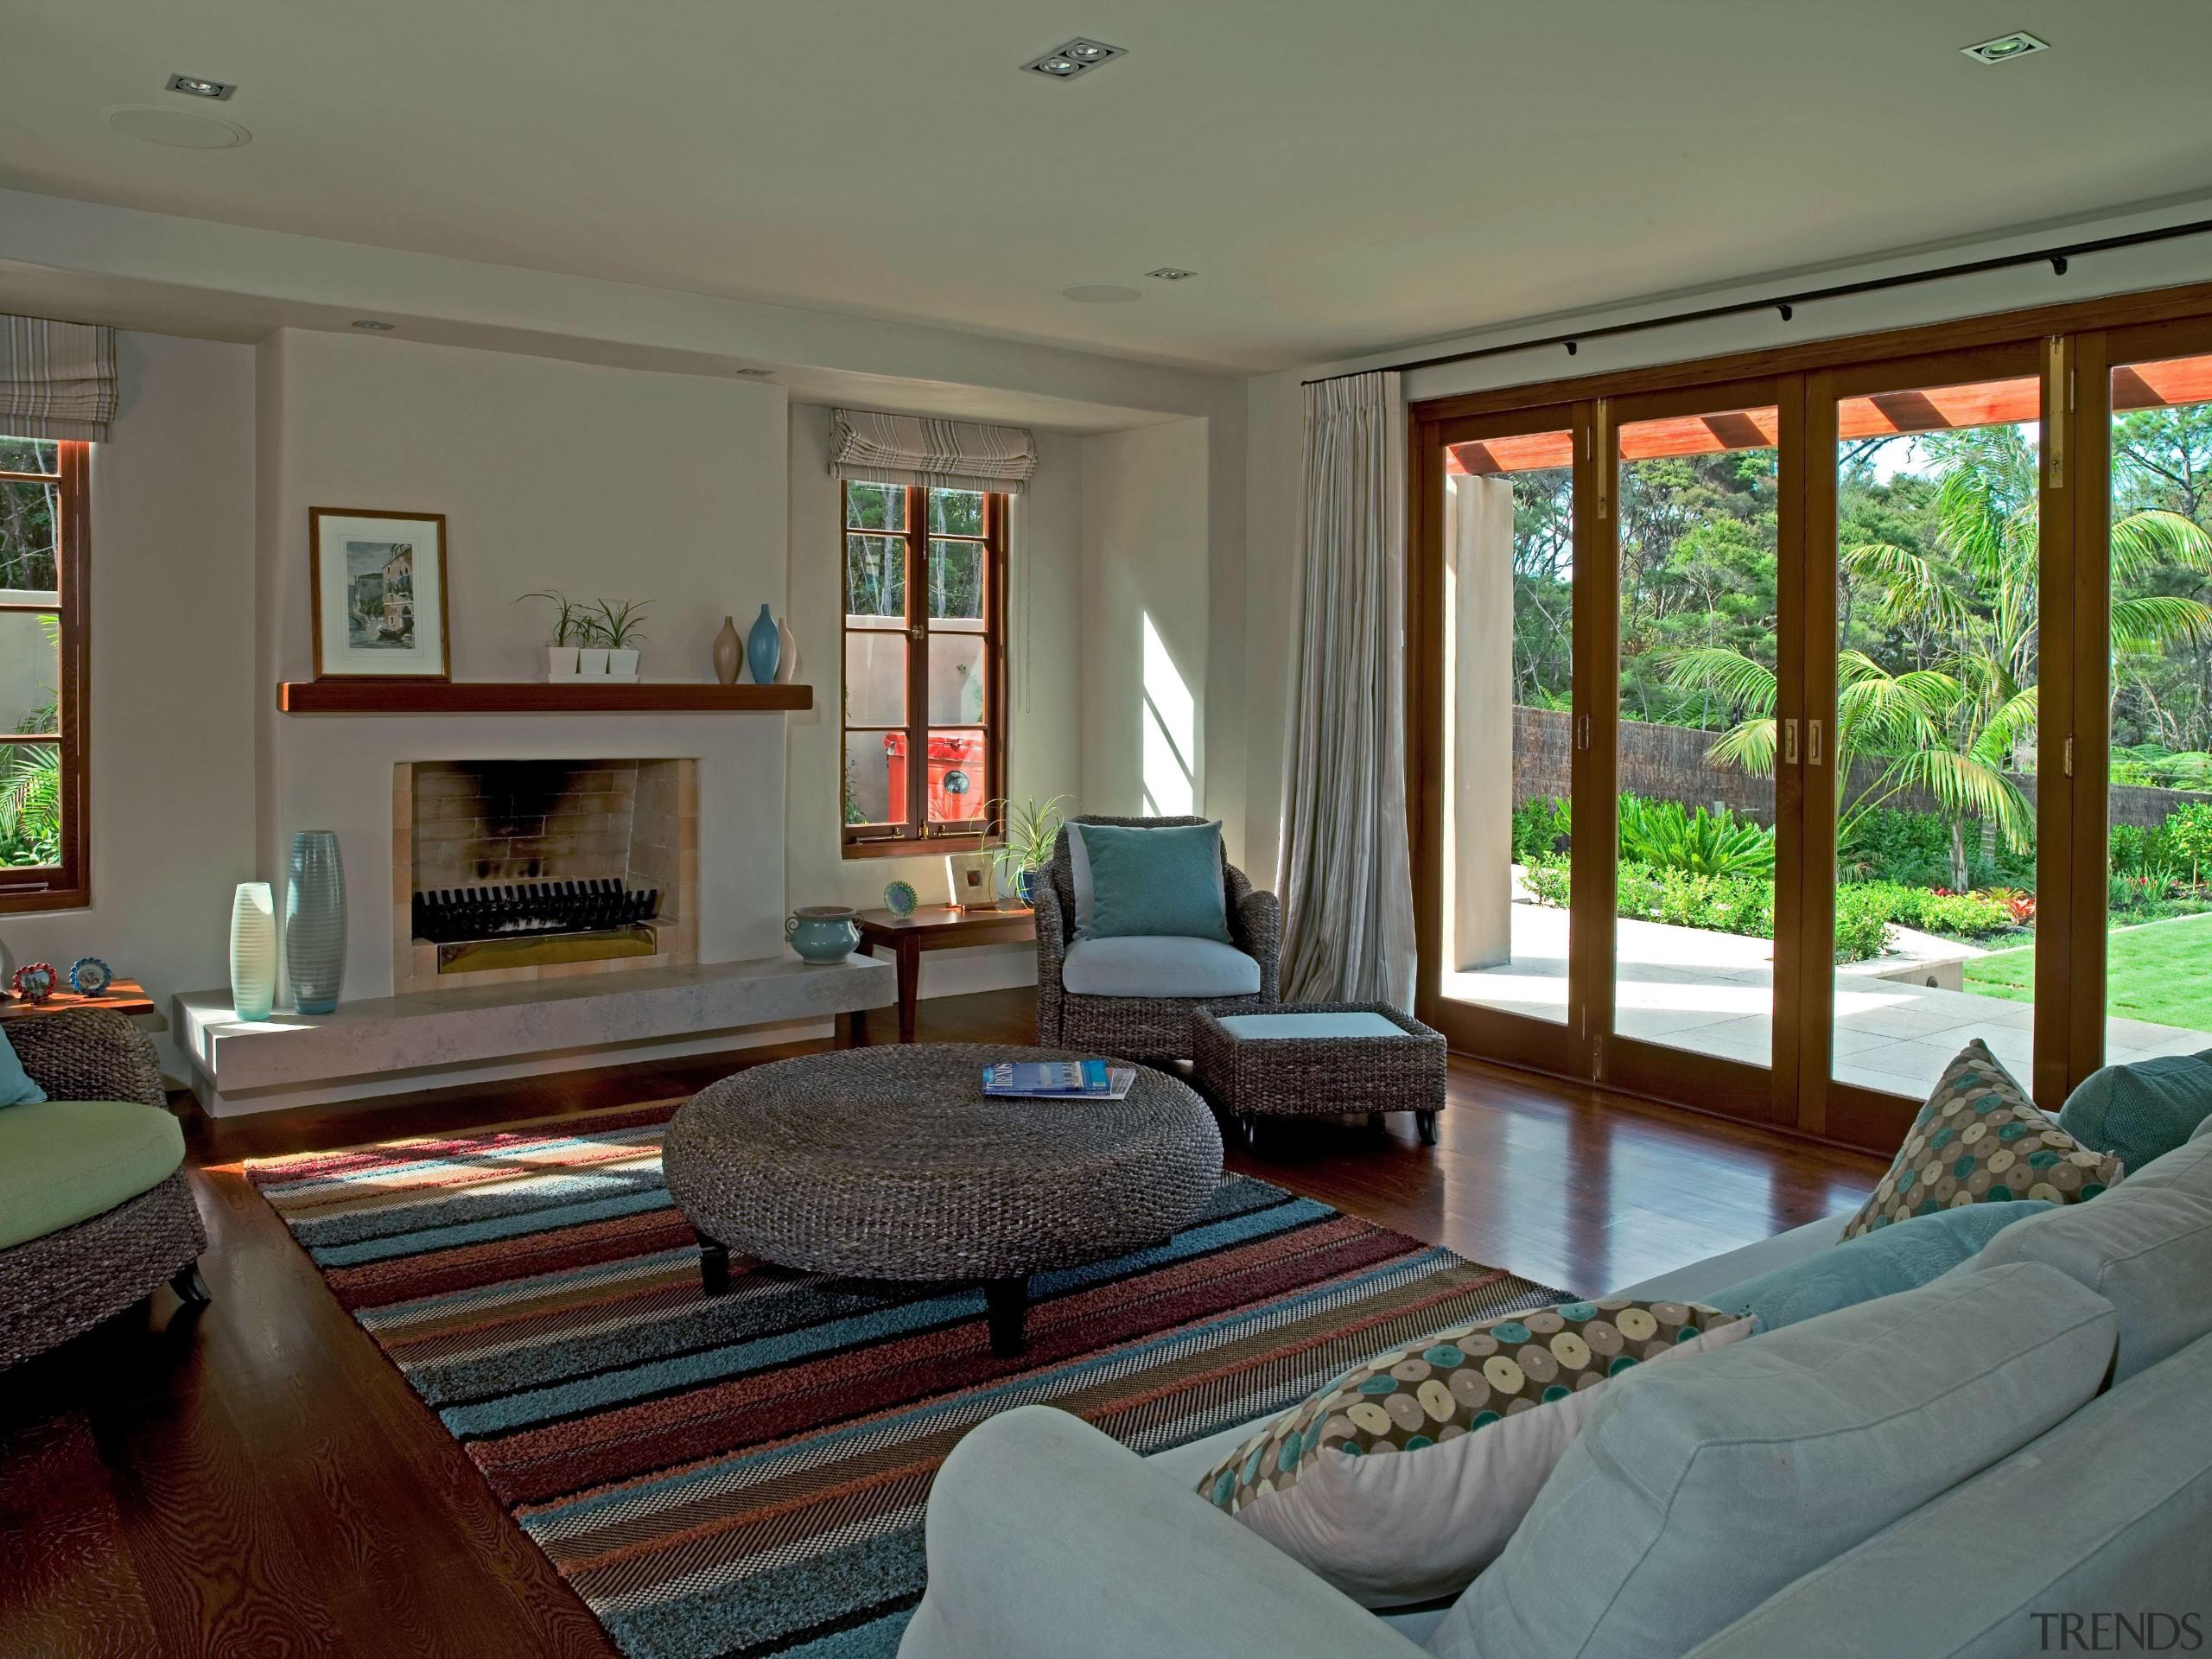 139 onetaunga family - Onetaunga Family - ceiling ceiling, estate, home, house, interior design, living room, property, real estate, room, window, gray